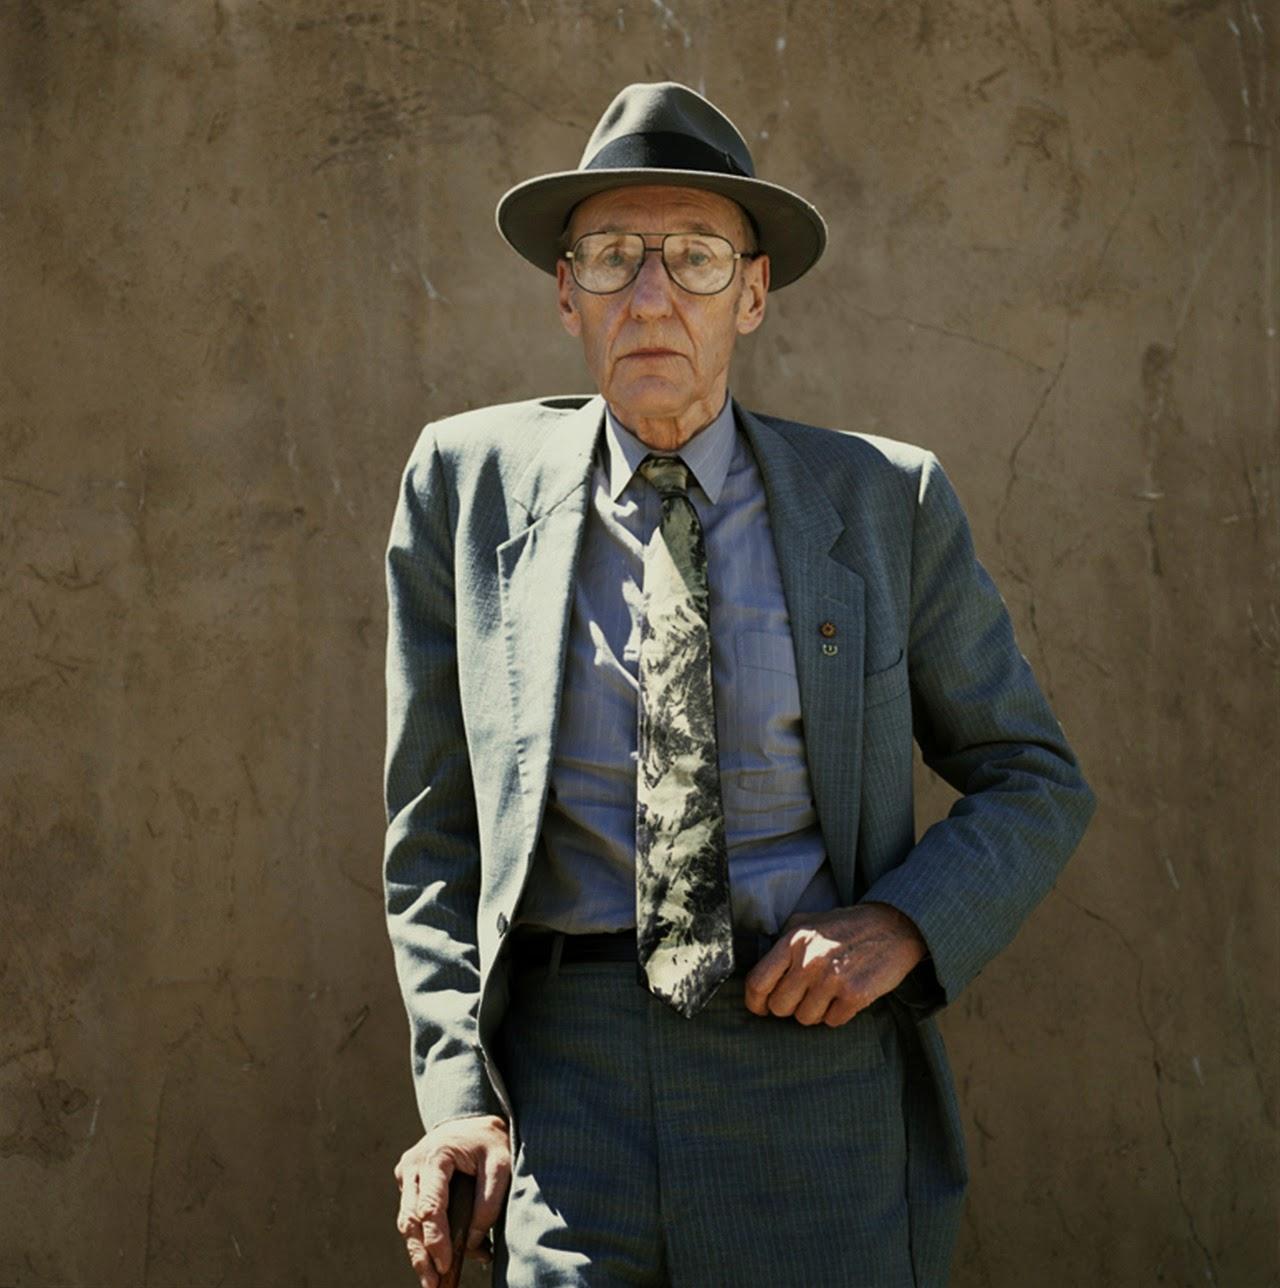 William Burroughs, 1950s. : OldSchoolCool